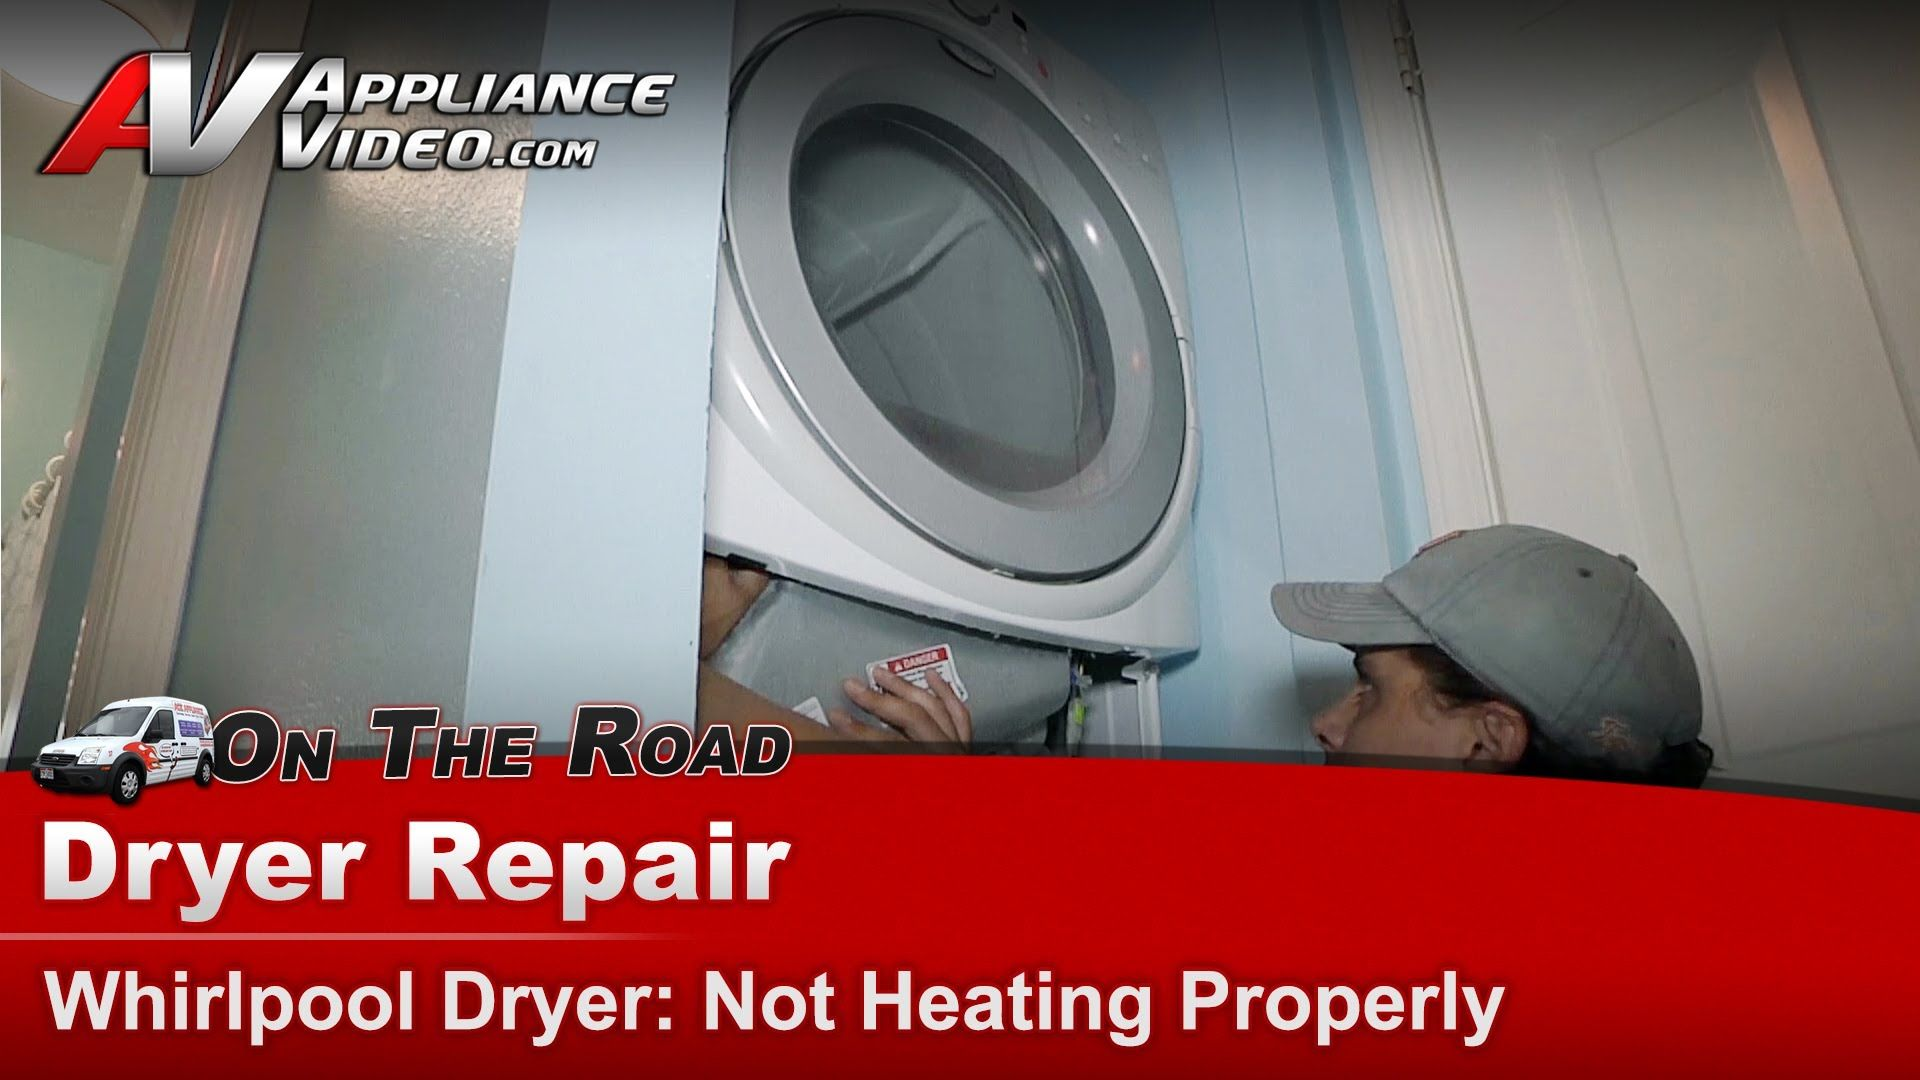 dryer repair not heating repair diagnostic whirlpool rh pinterest com whirlpool  dryer repair instructions Whirlpool Duet Dryer Schematic